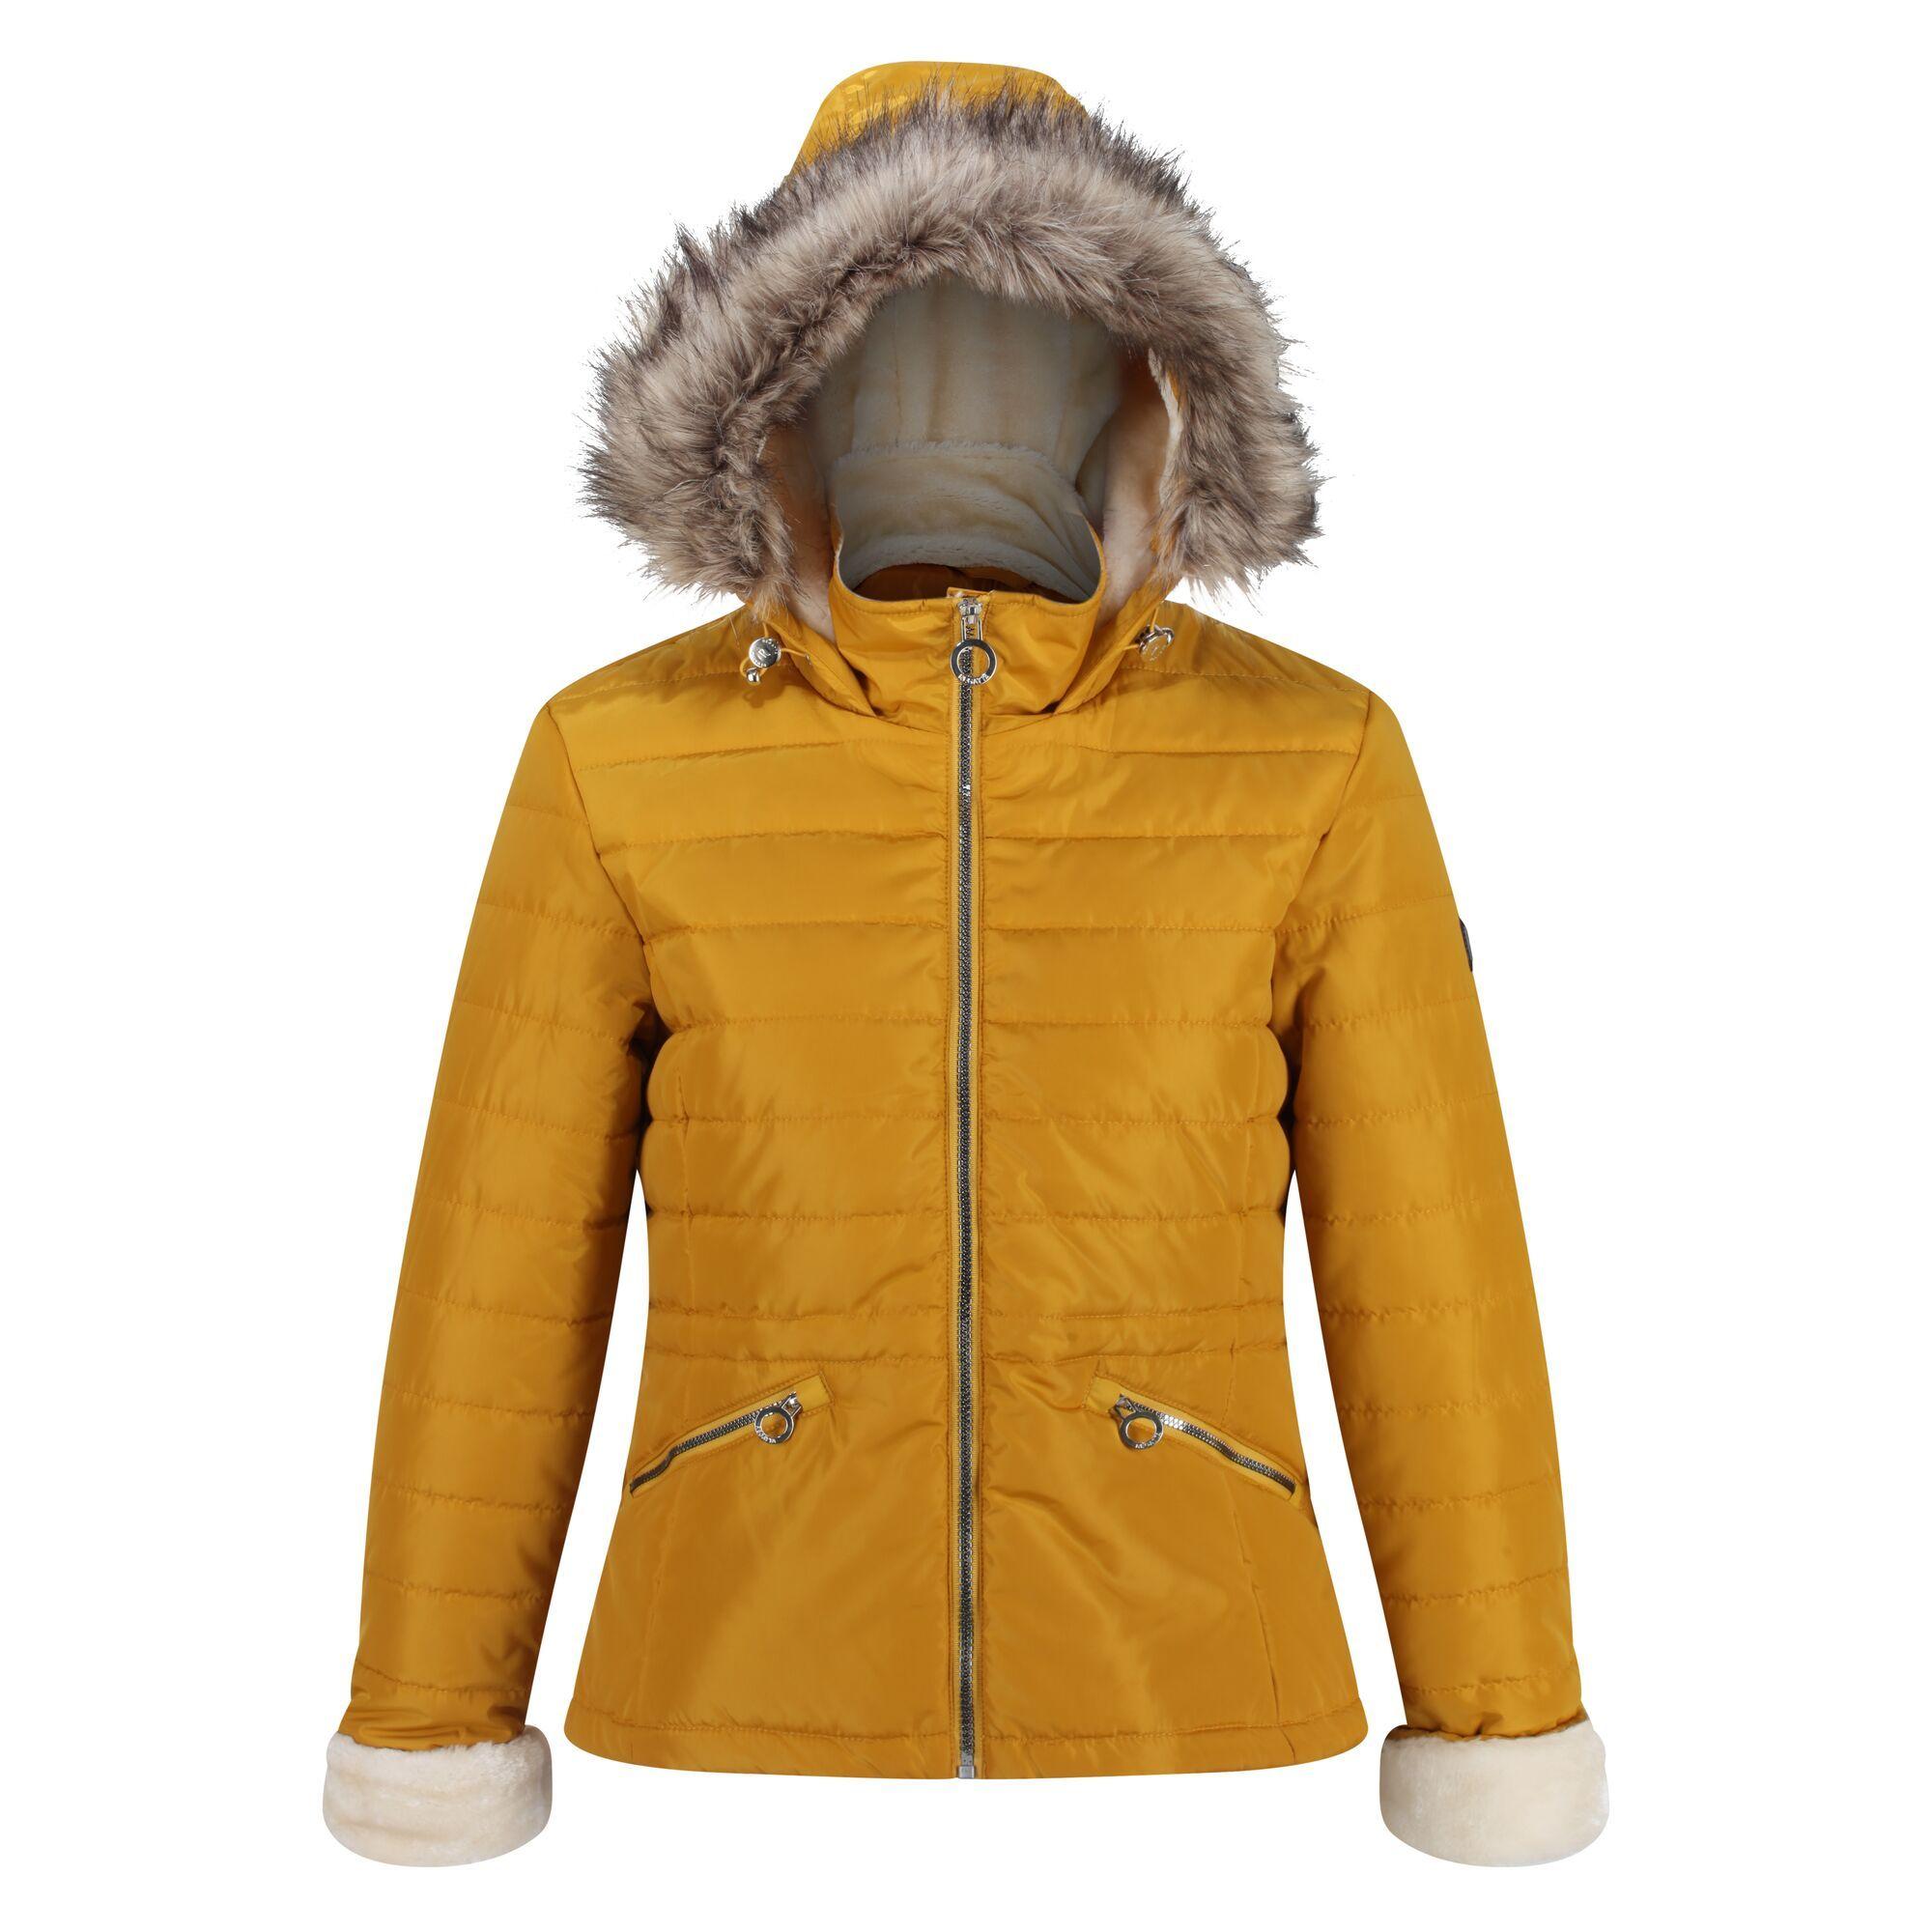 Regatta Womens/Ladies Westlynn Quilted Insulated Jacket (16 UK) (Mustard Seed)